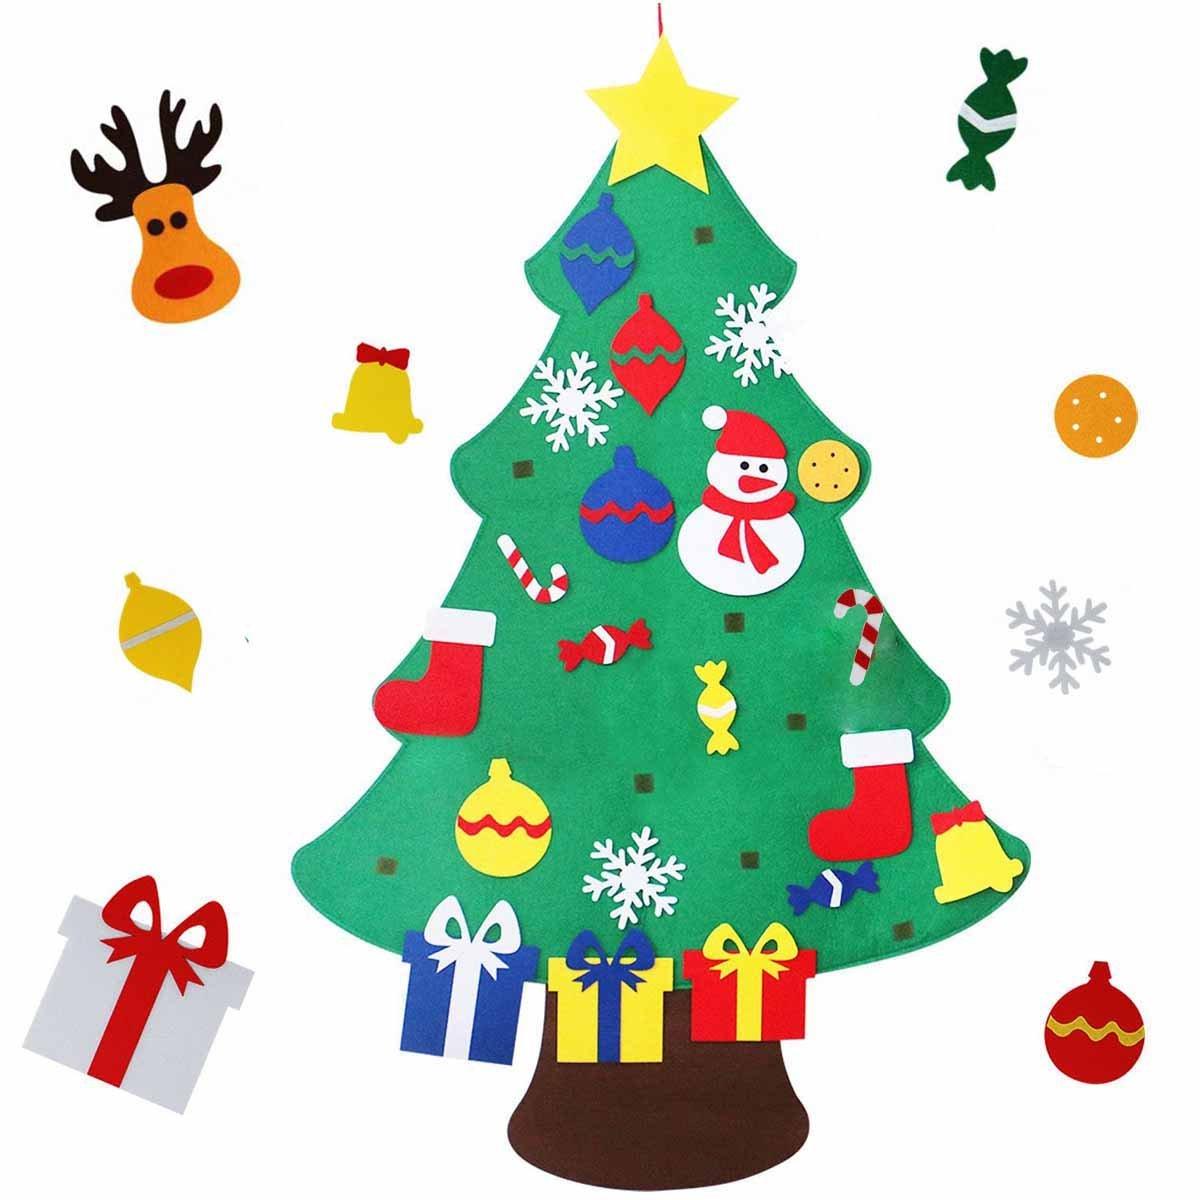 Felt Christmas Tree, MeeDoo 3.28FT DIY Christmas Tree with 30pcs Ornaments Wall Decoration for New Year Kids Christmas Xmas Gifts, Door Wall Hanging Xmas Decoration